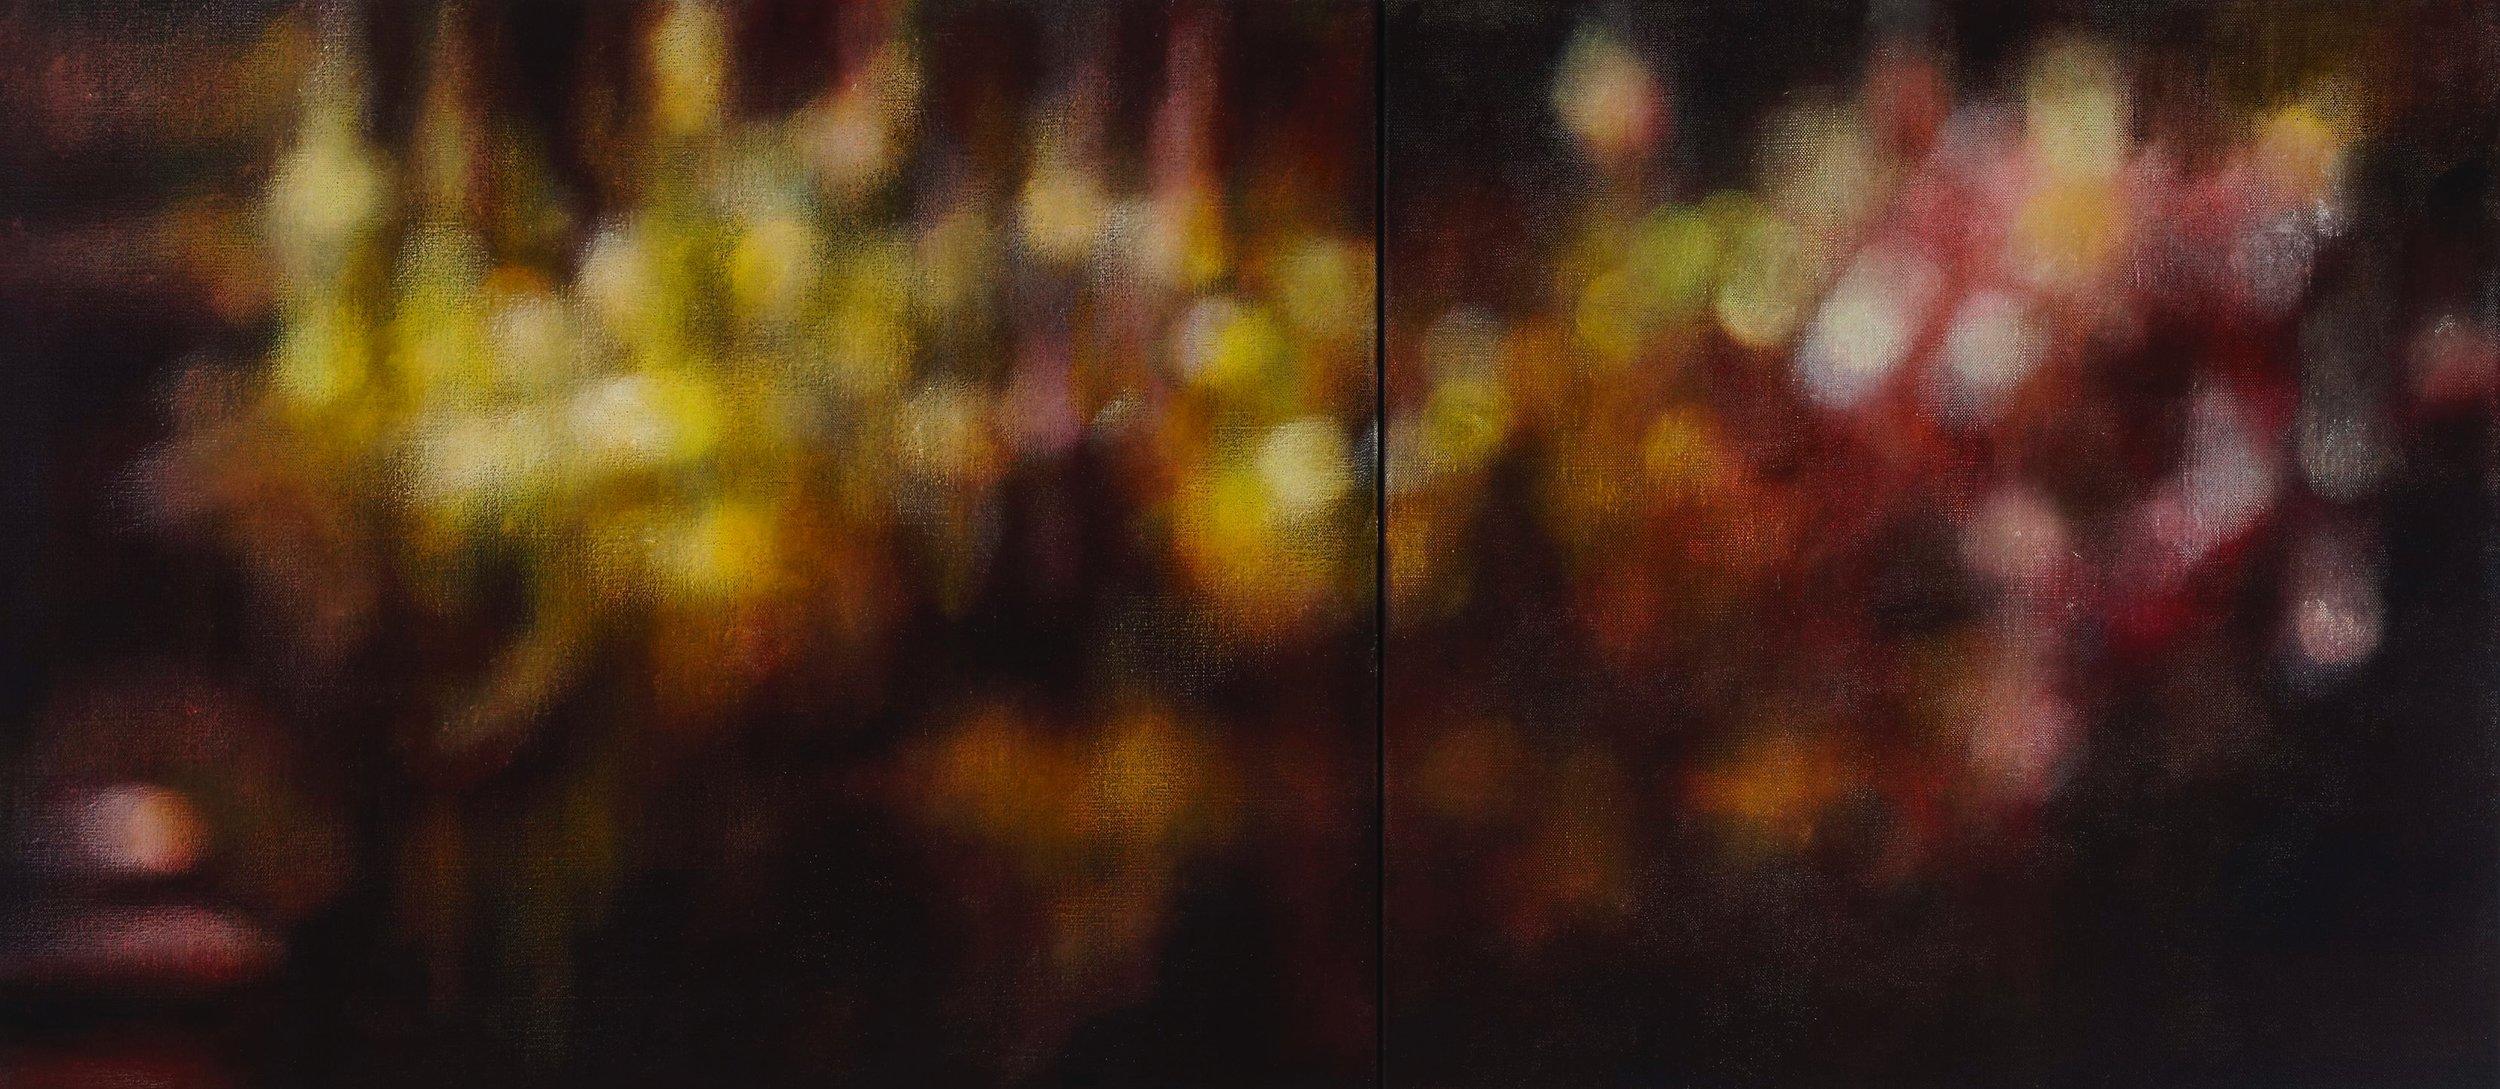 Venetian lights, 2012, oil on canvas, 61x137cm